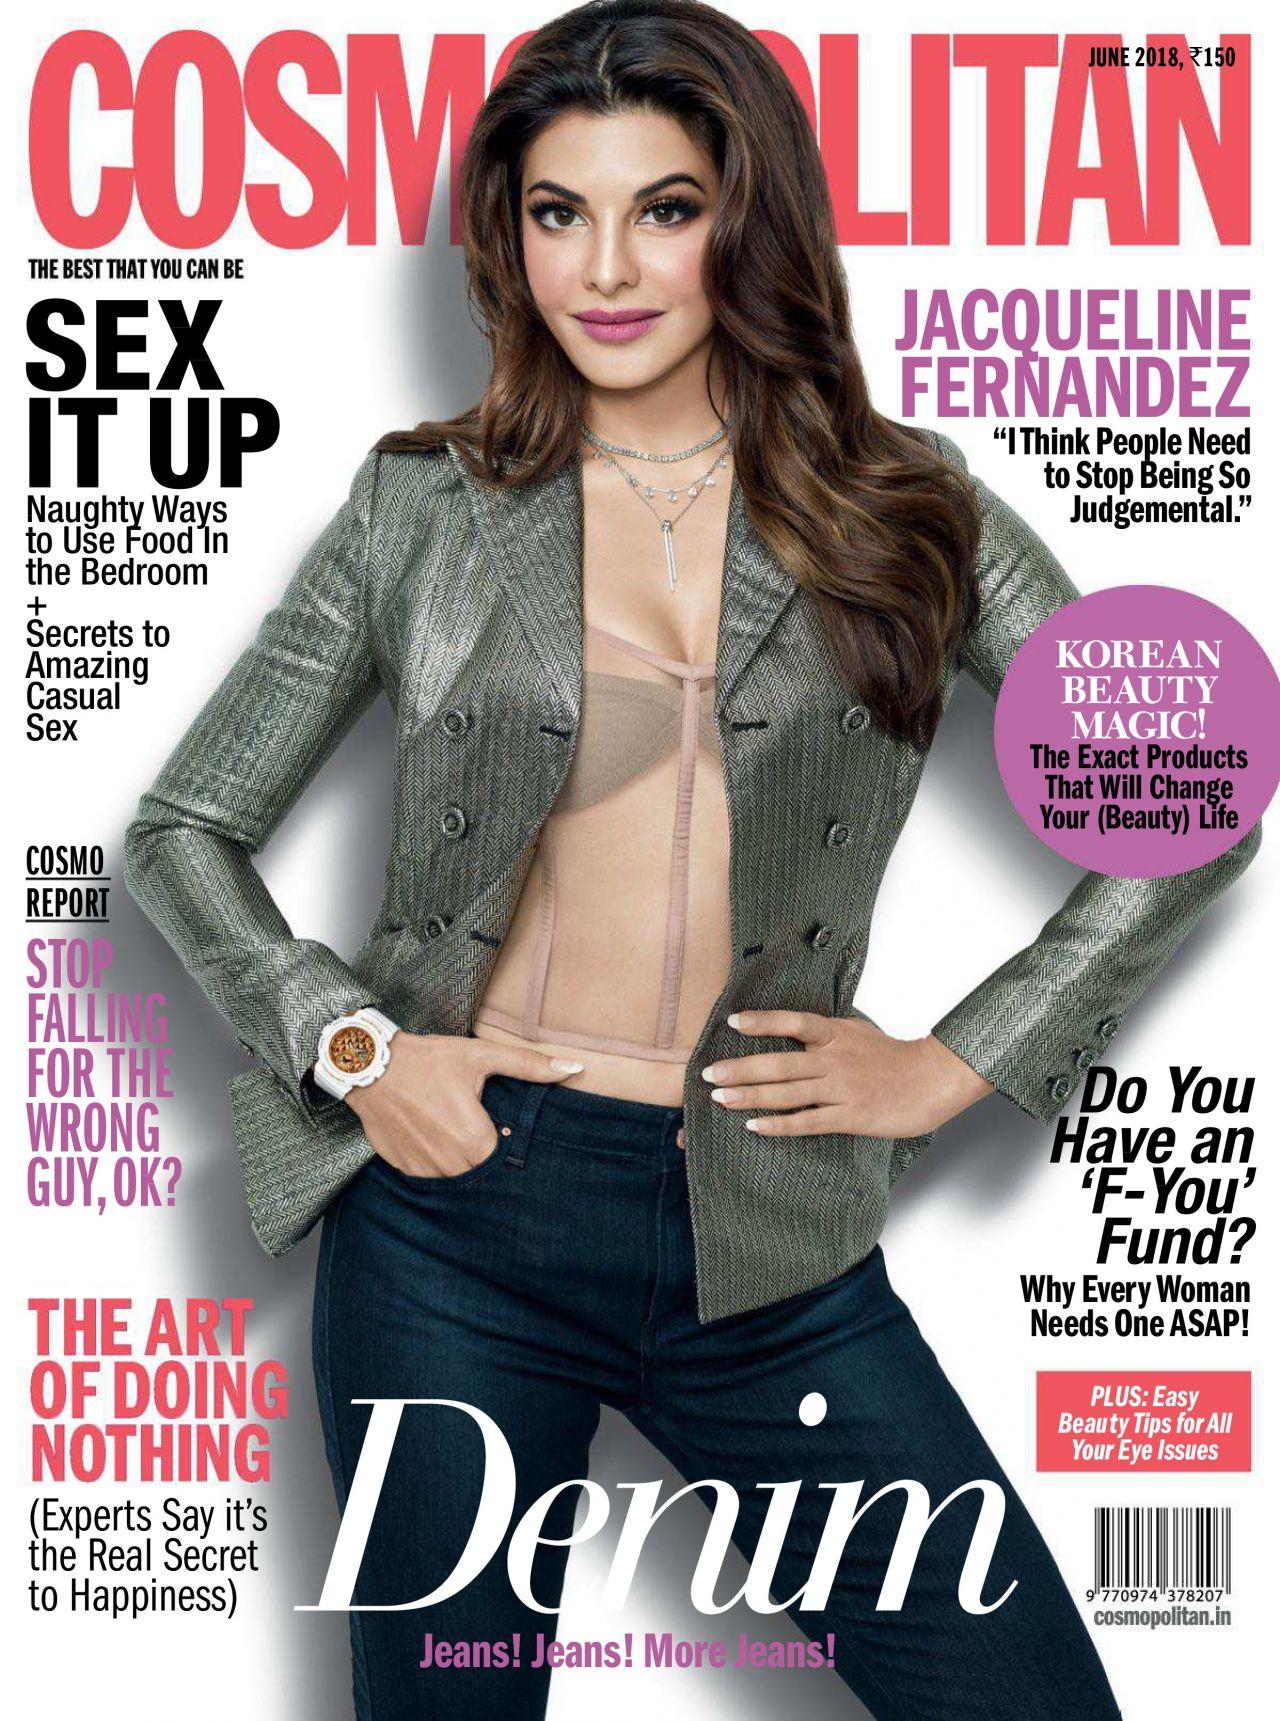 Jacqueline Fernandez Cosmopolitan India June 2018